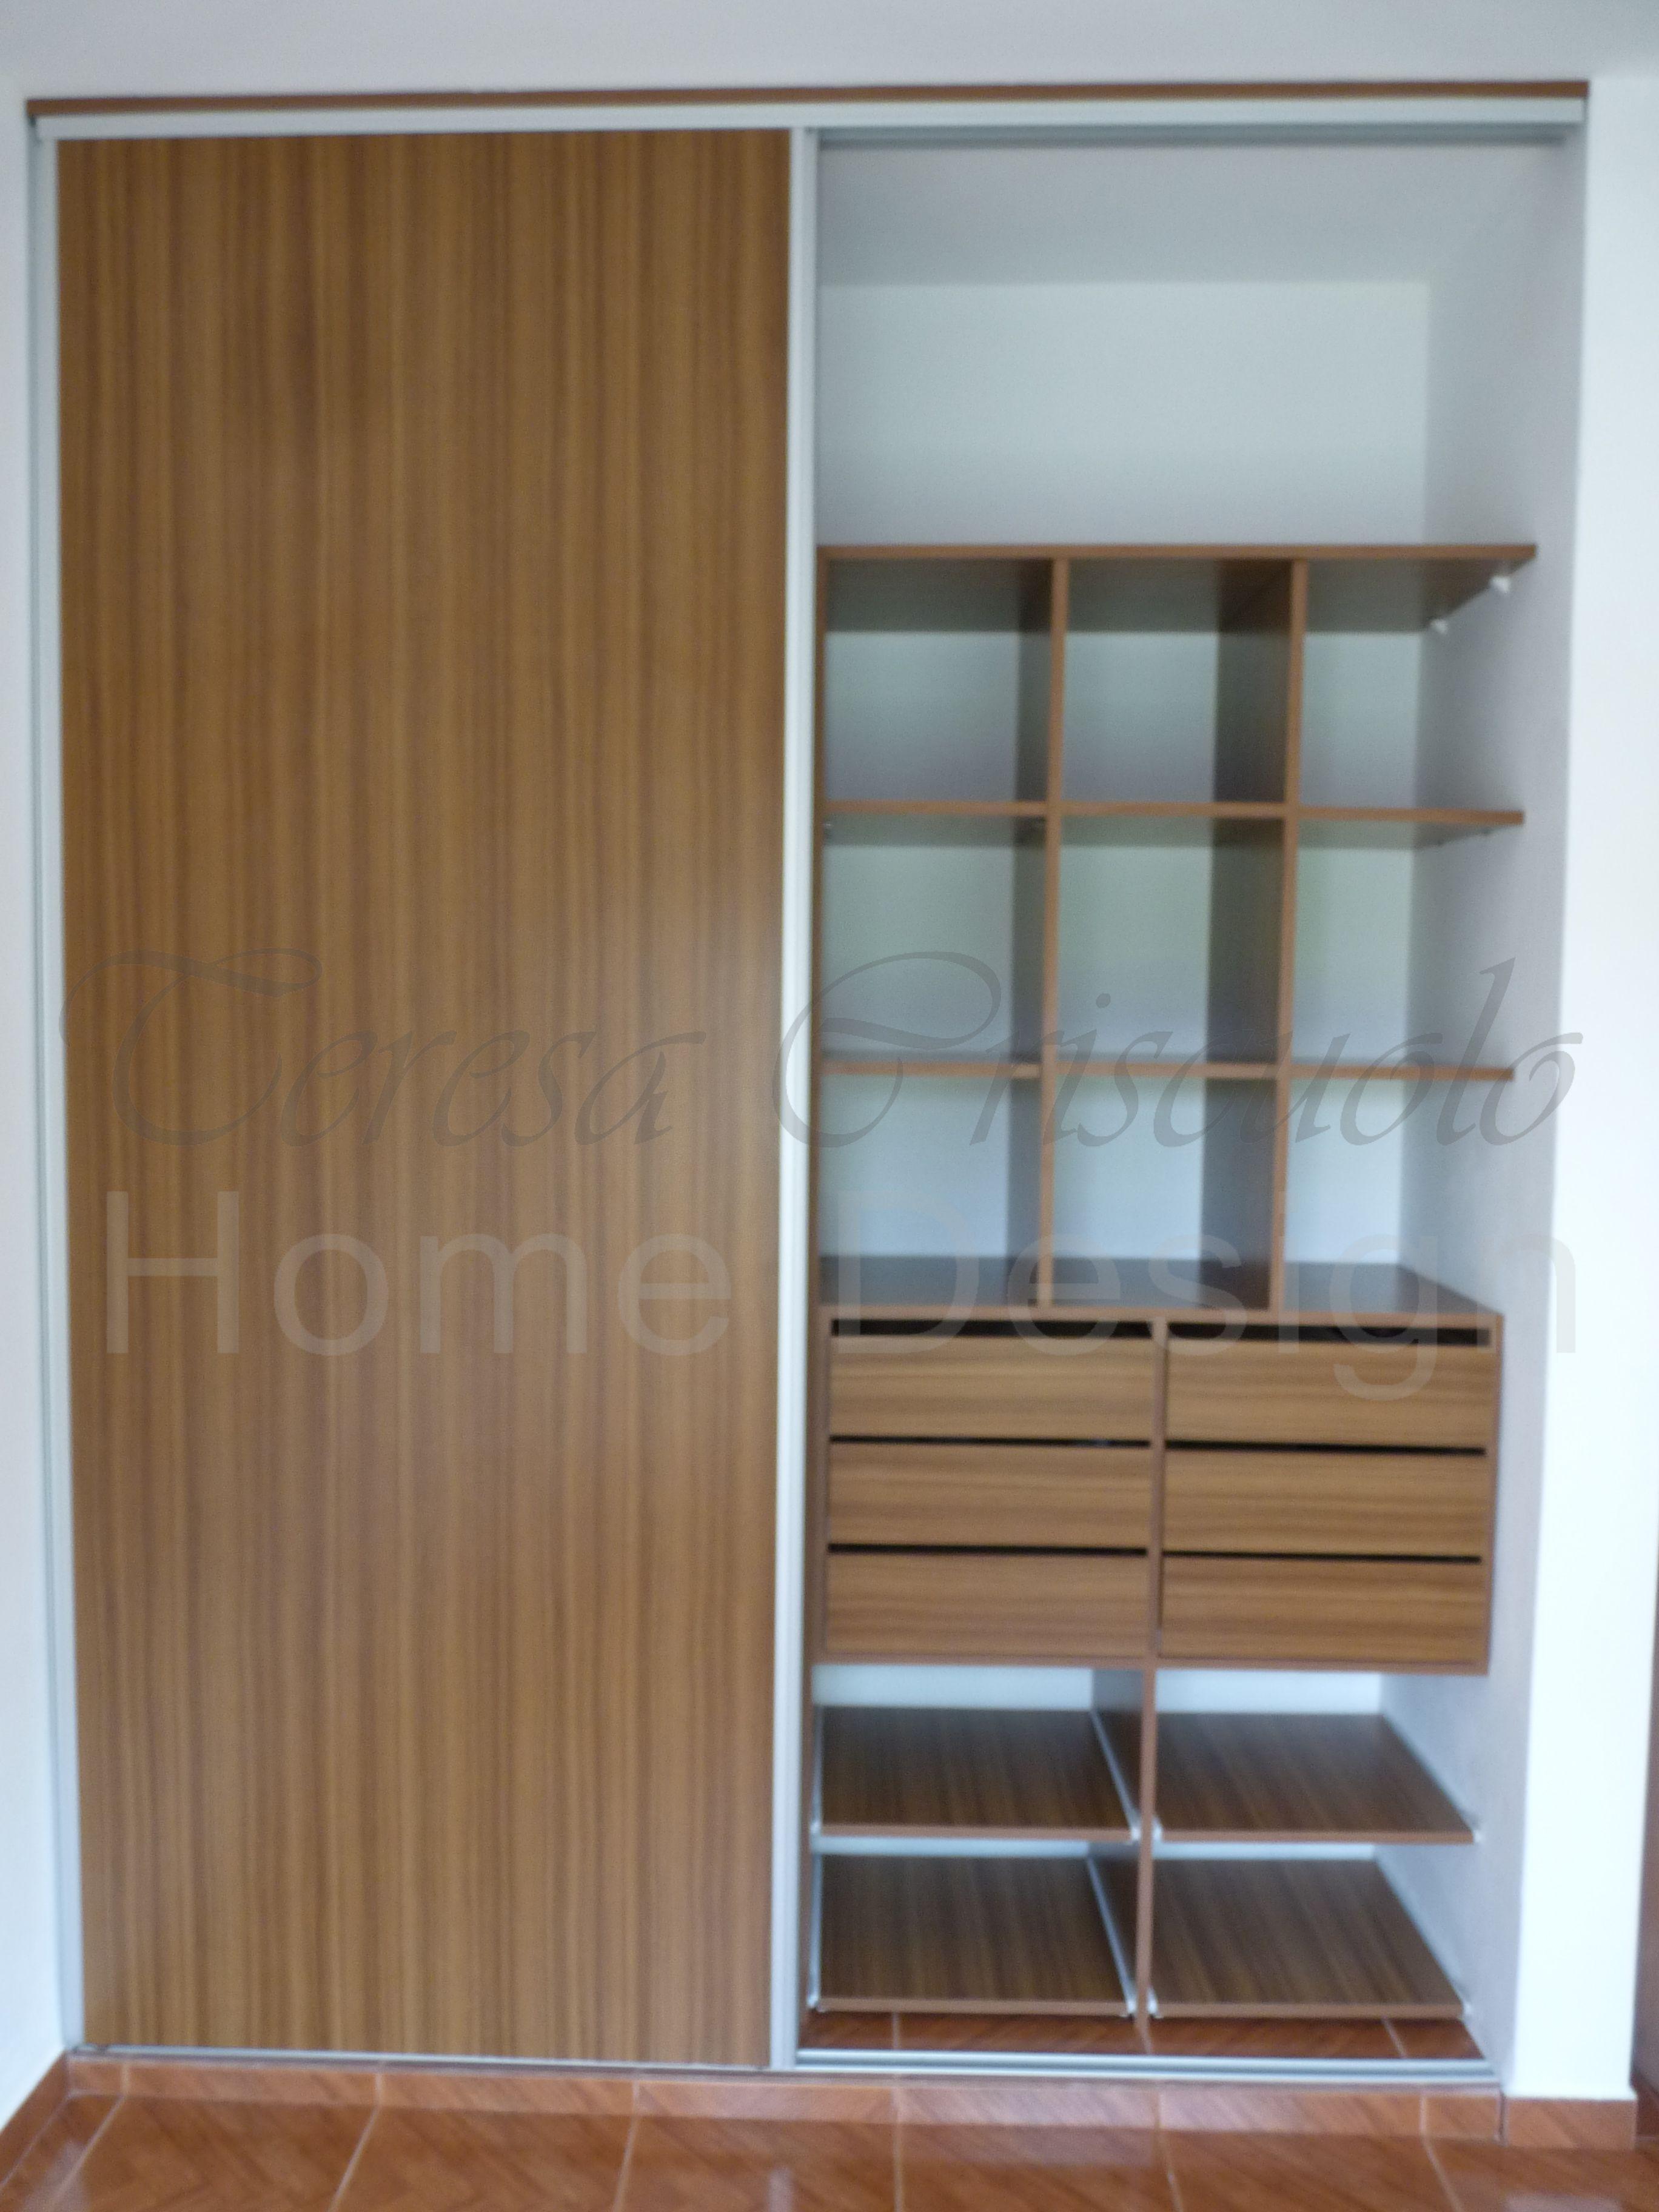 Puertas de placard corredizas en melamina con perfil de for Perfiles aluminio para muebles